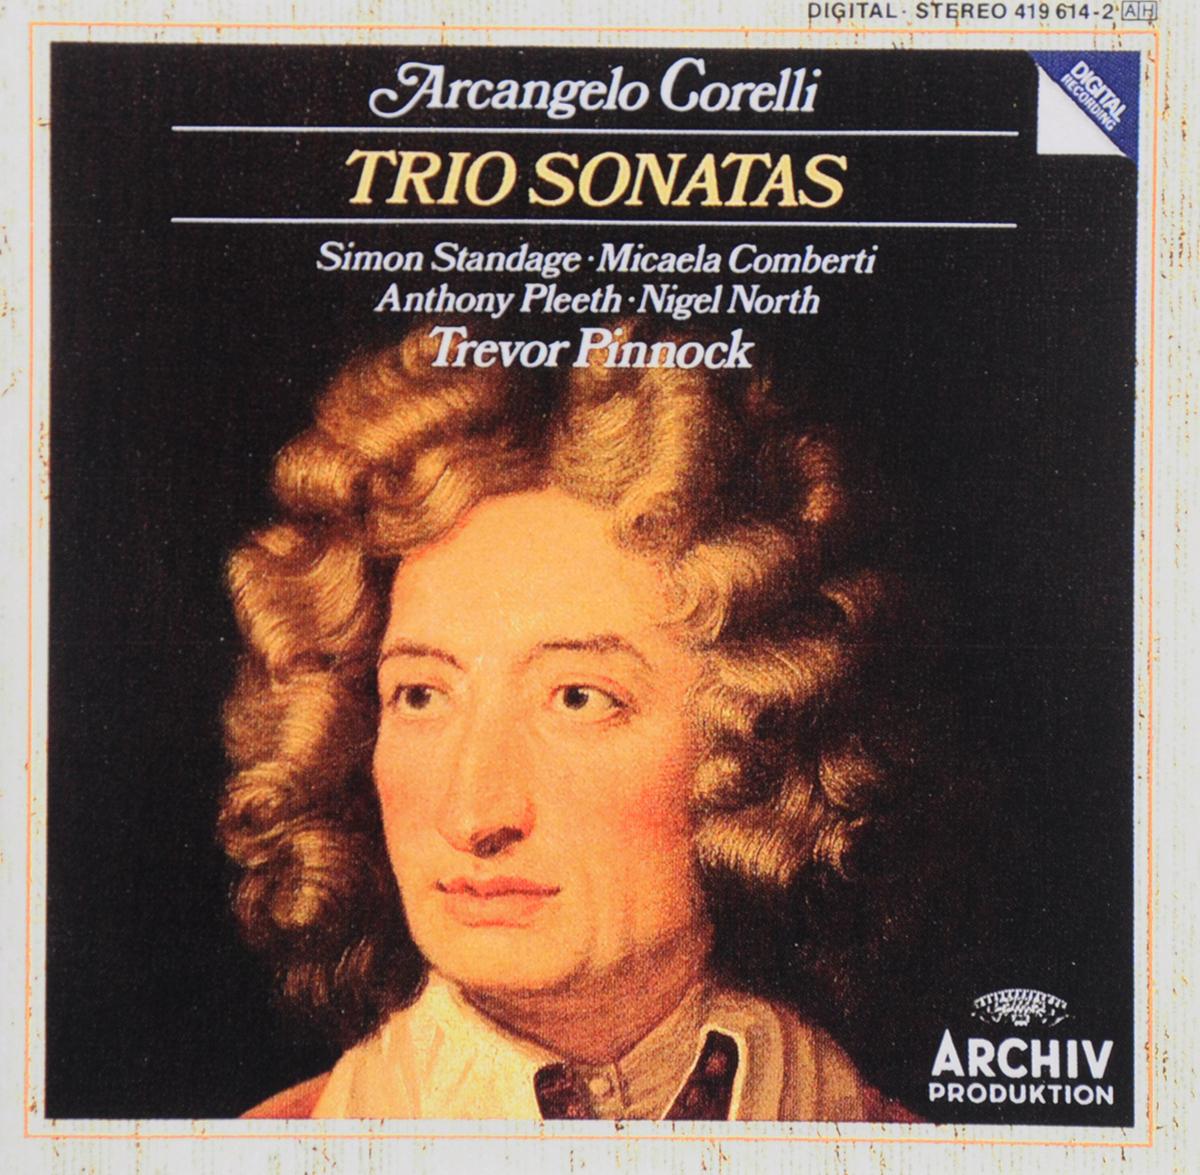 Тревор Пиннок Trevor Pinnock. Arcangelo Corelli. Trio Sonatas the english concert тревор пиннок trevor pinnock handel trio sonatas